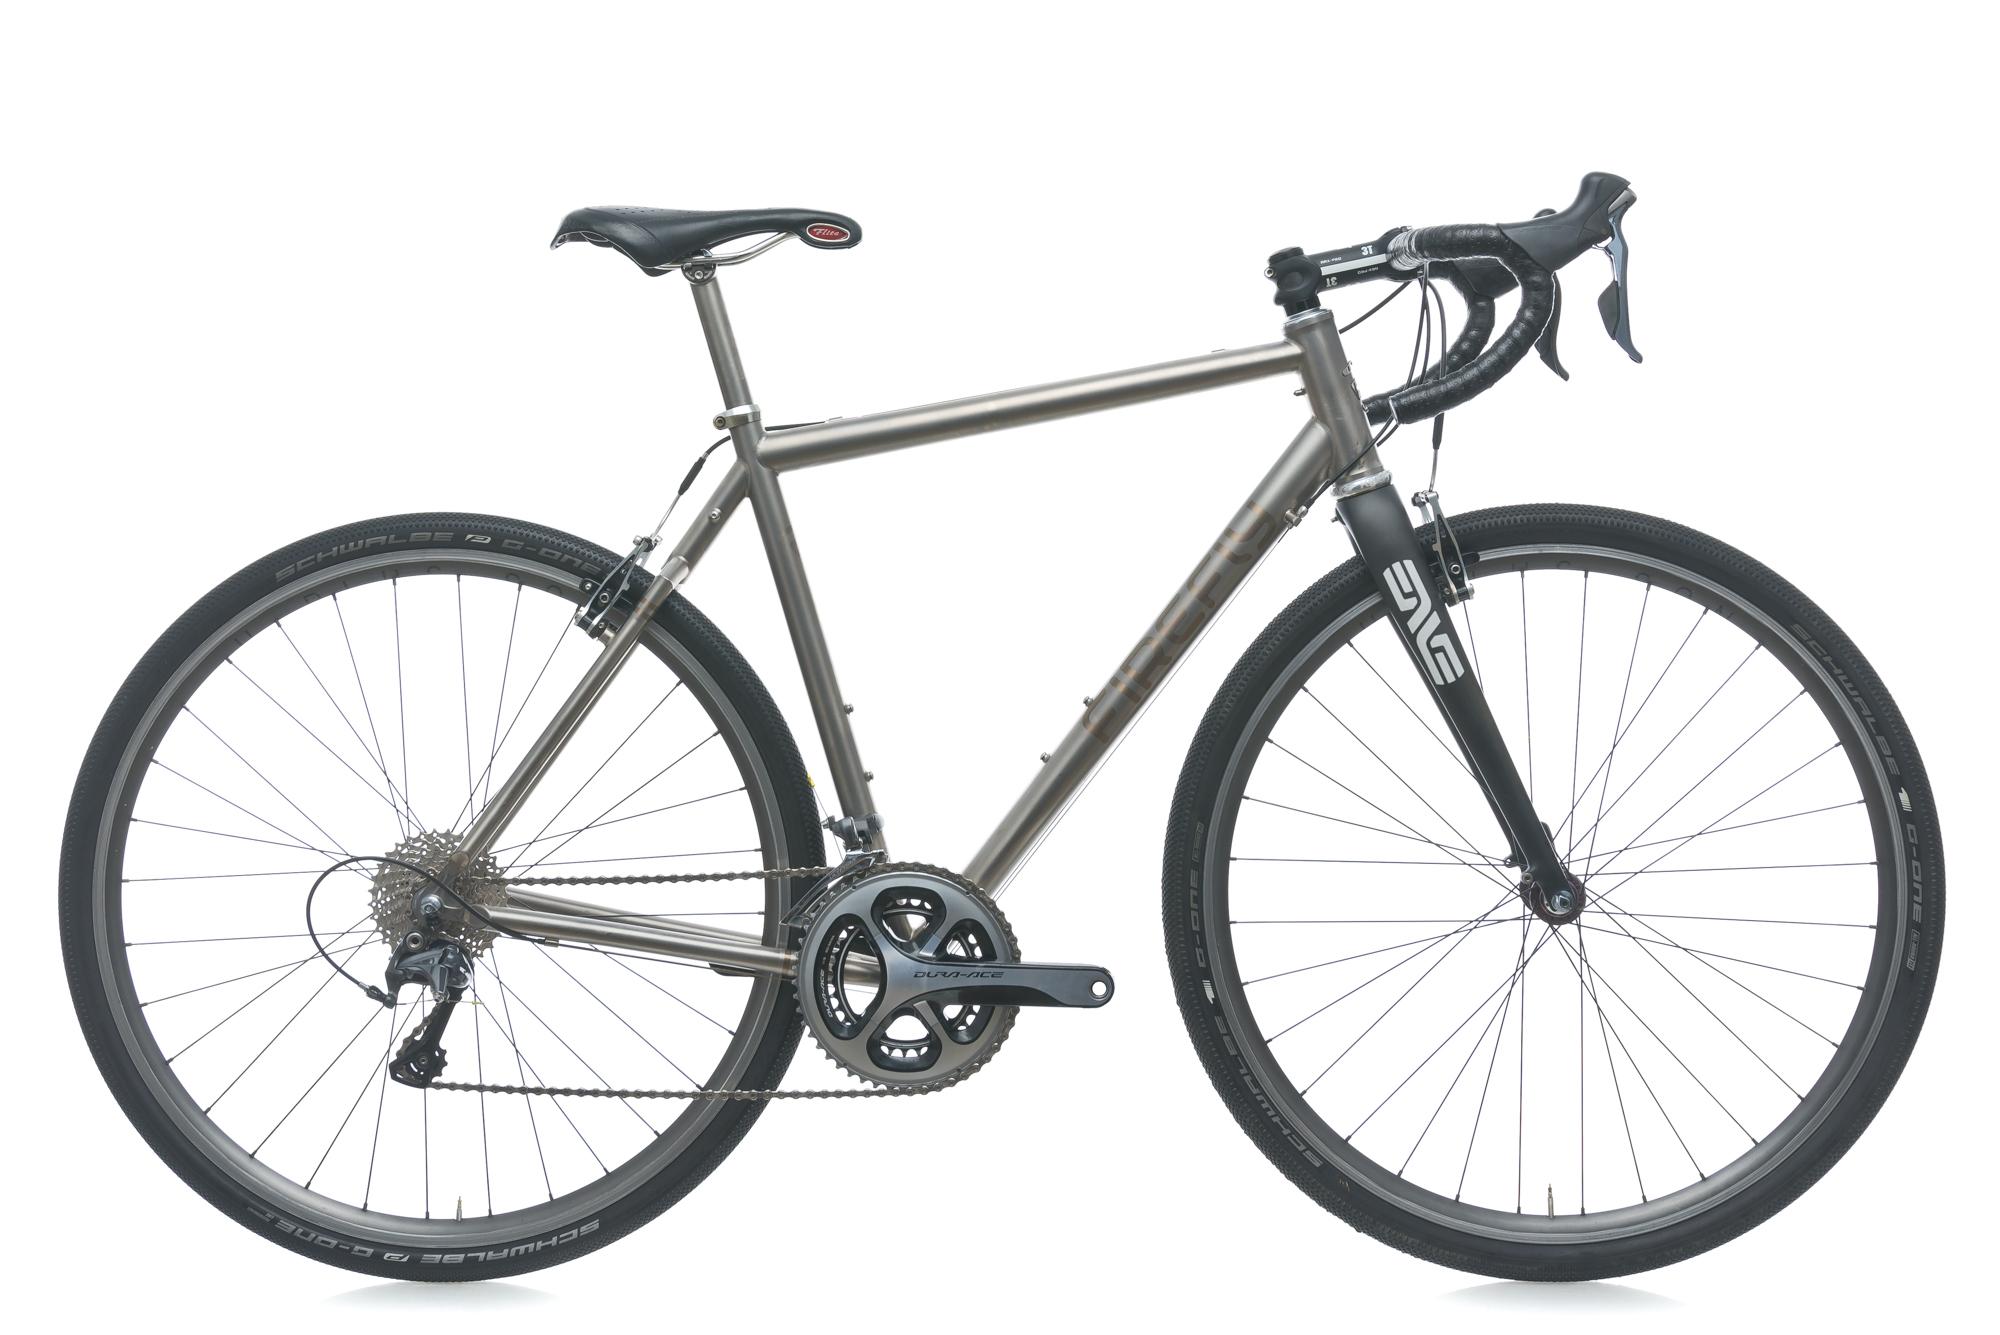 2011 Firefly Cyclocross Bike 53cm Titanium Ultegra Dura-Ace ENVE ...